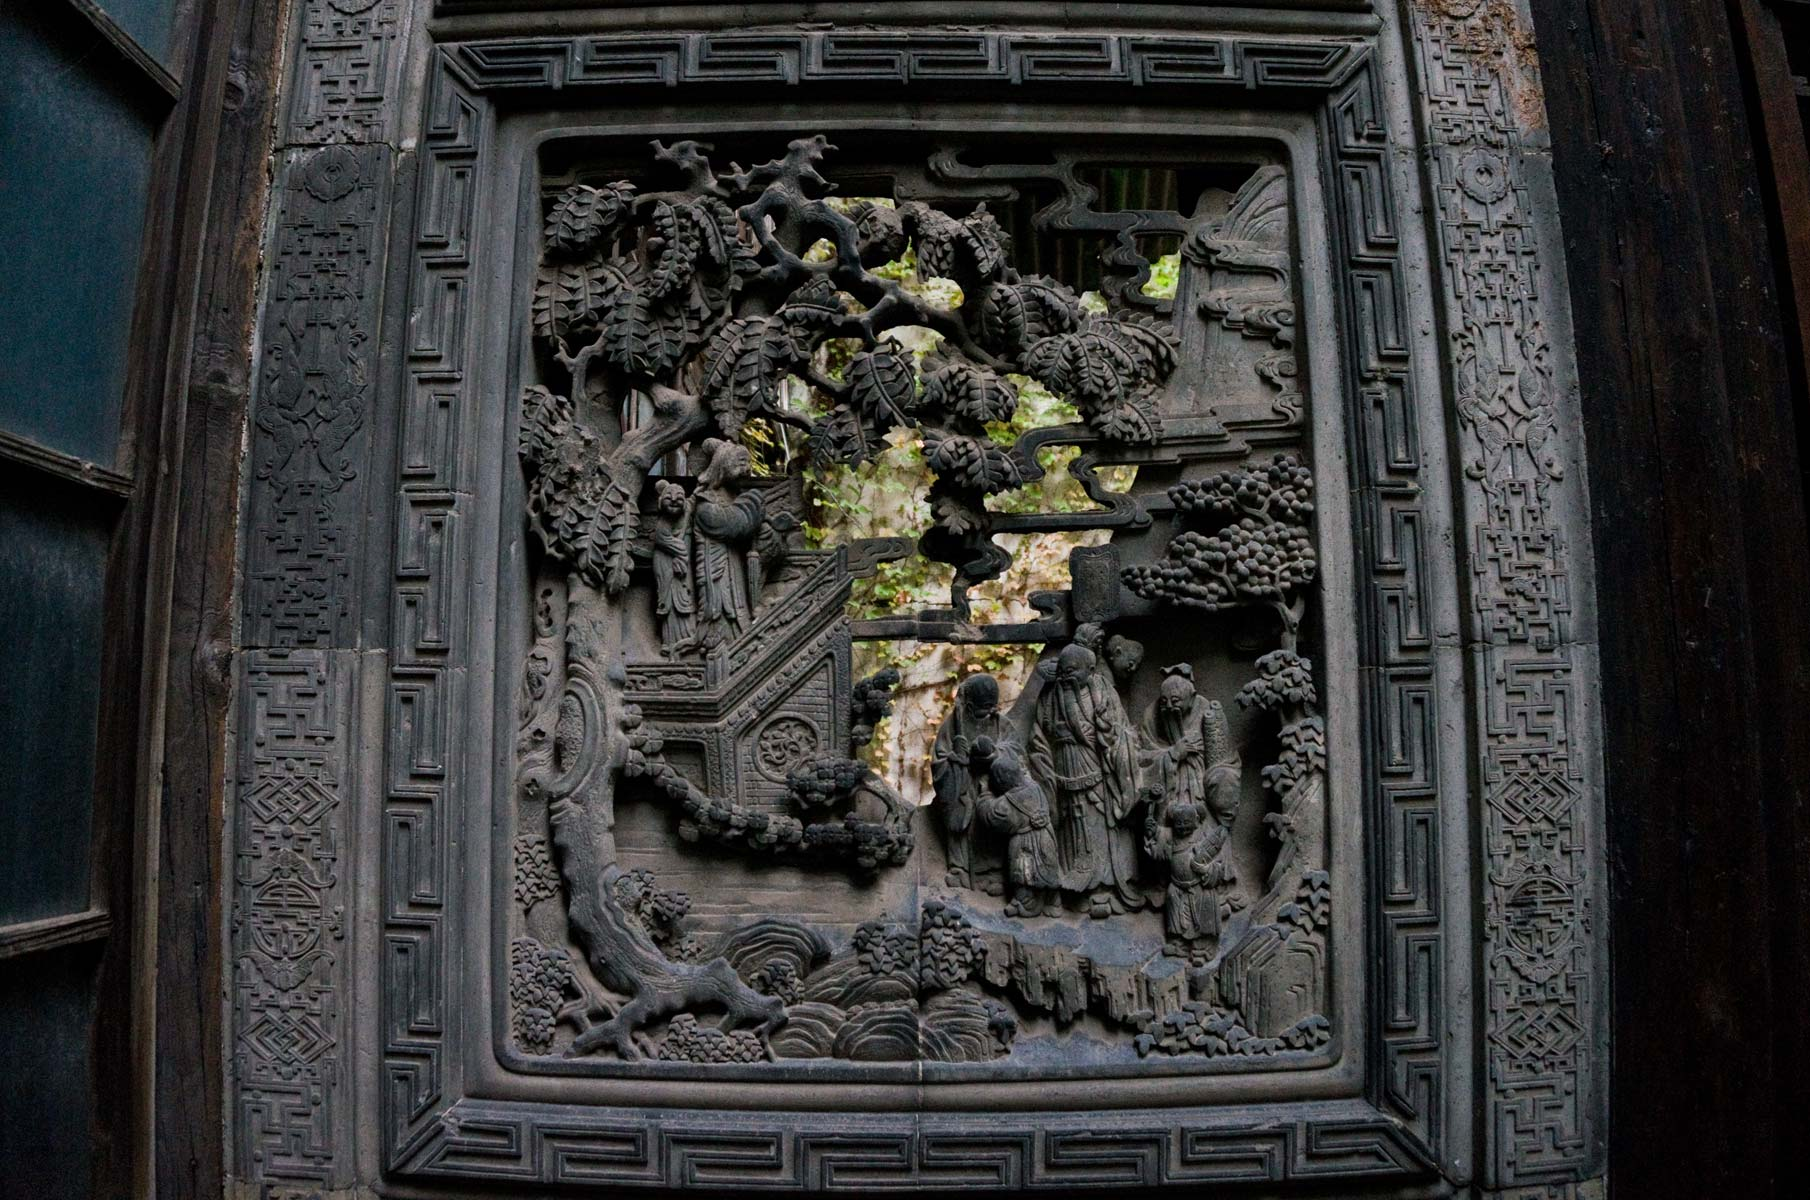 Kunstvolles Fenster im Shuyinlou 书隐楼 Anwesen in Shanghai, China